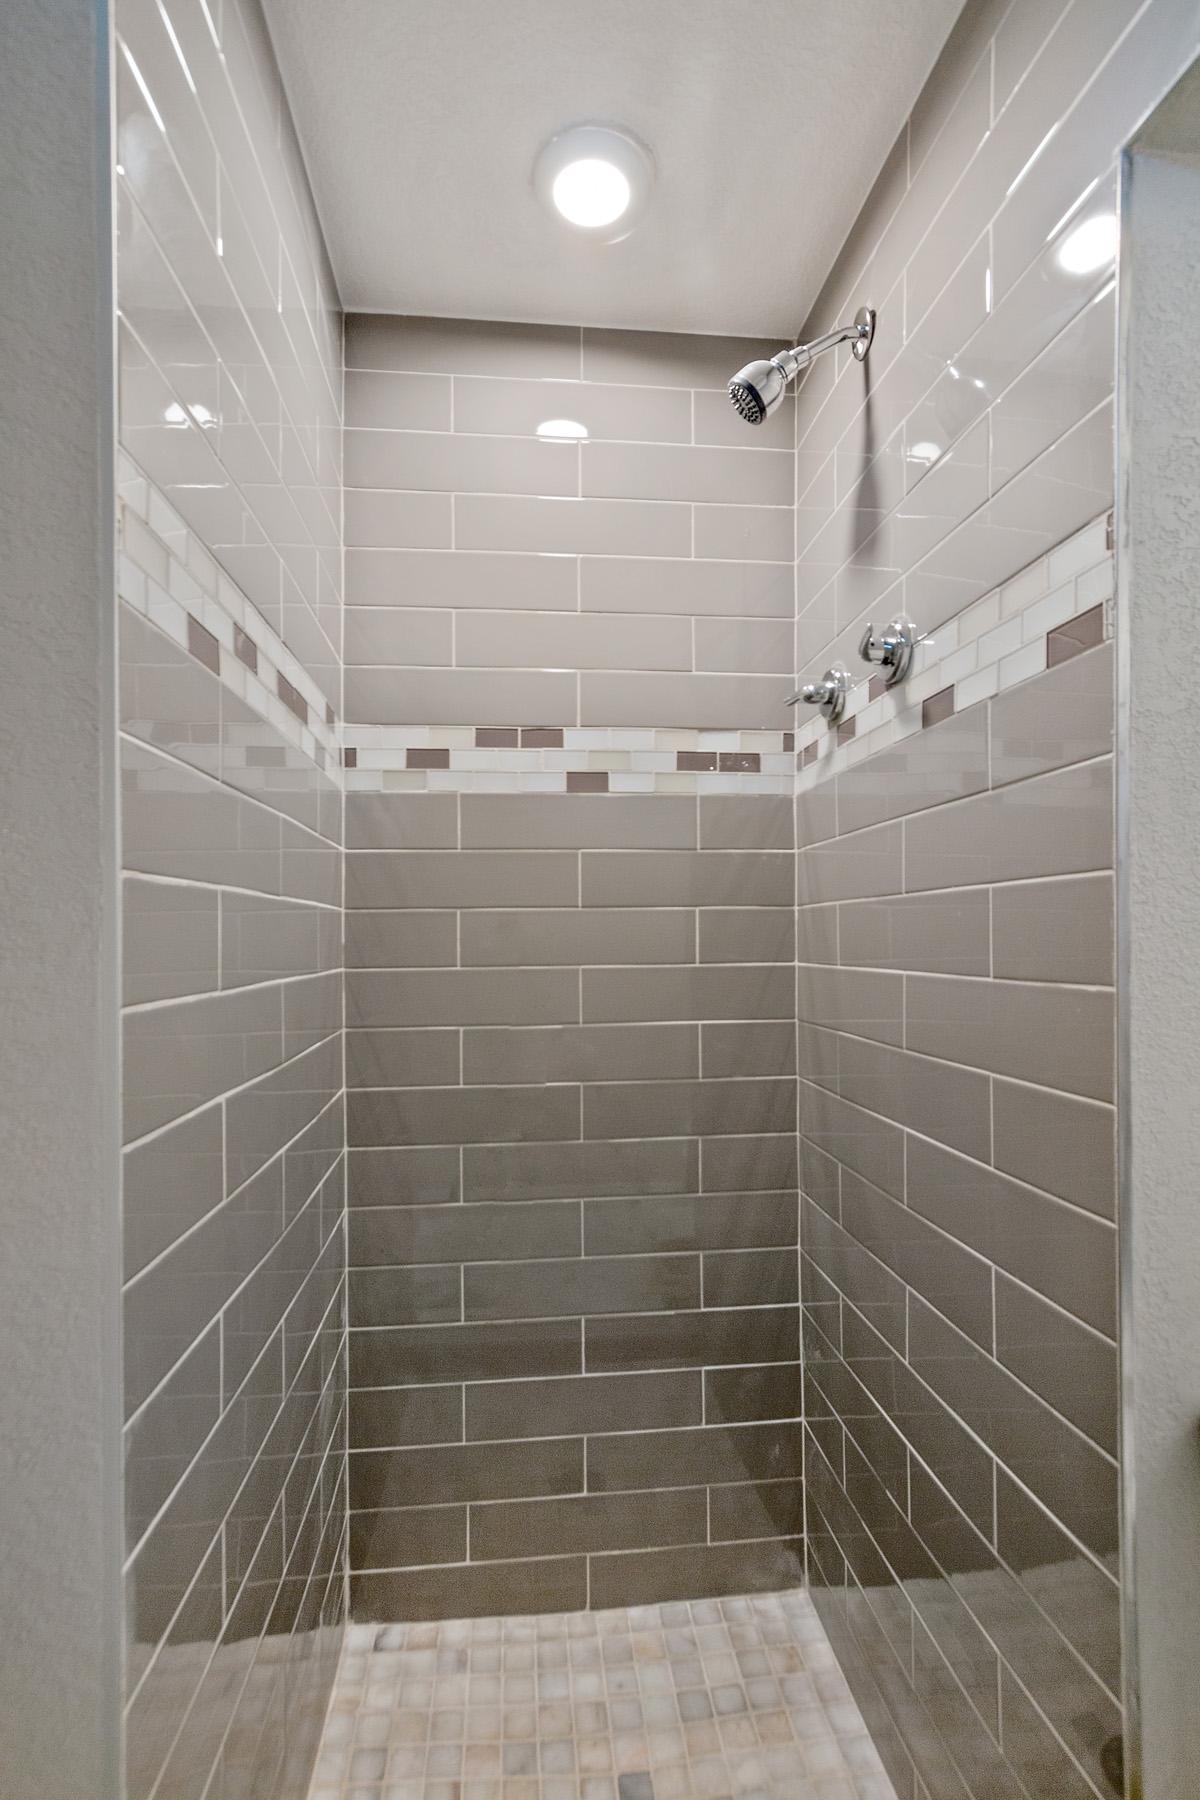 09-Bathroom Shower.jpg